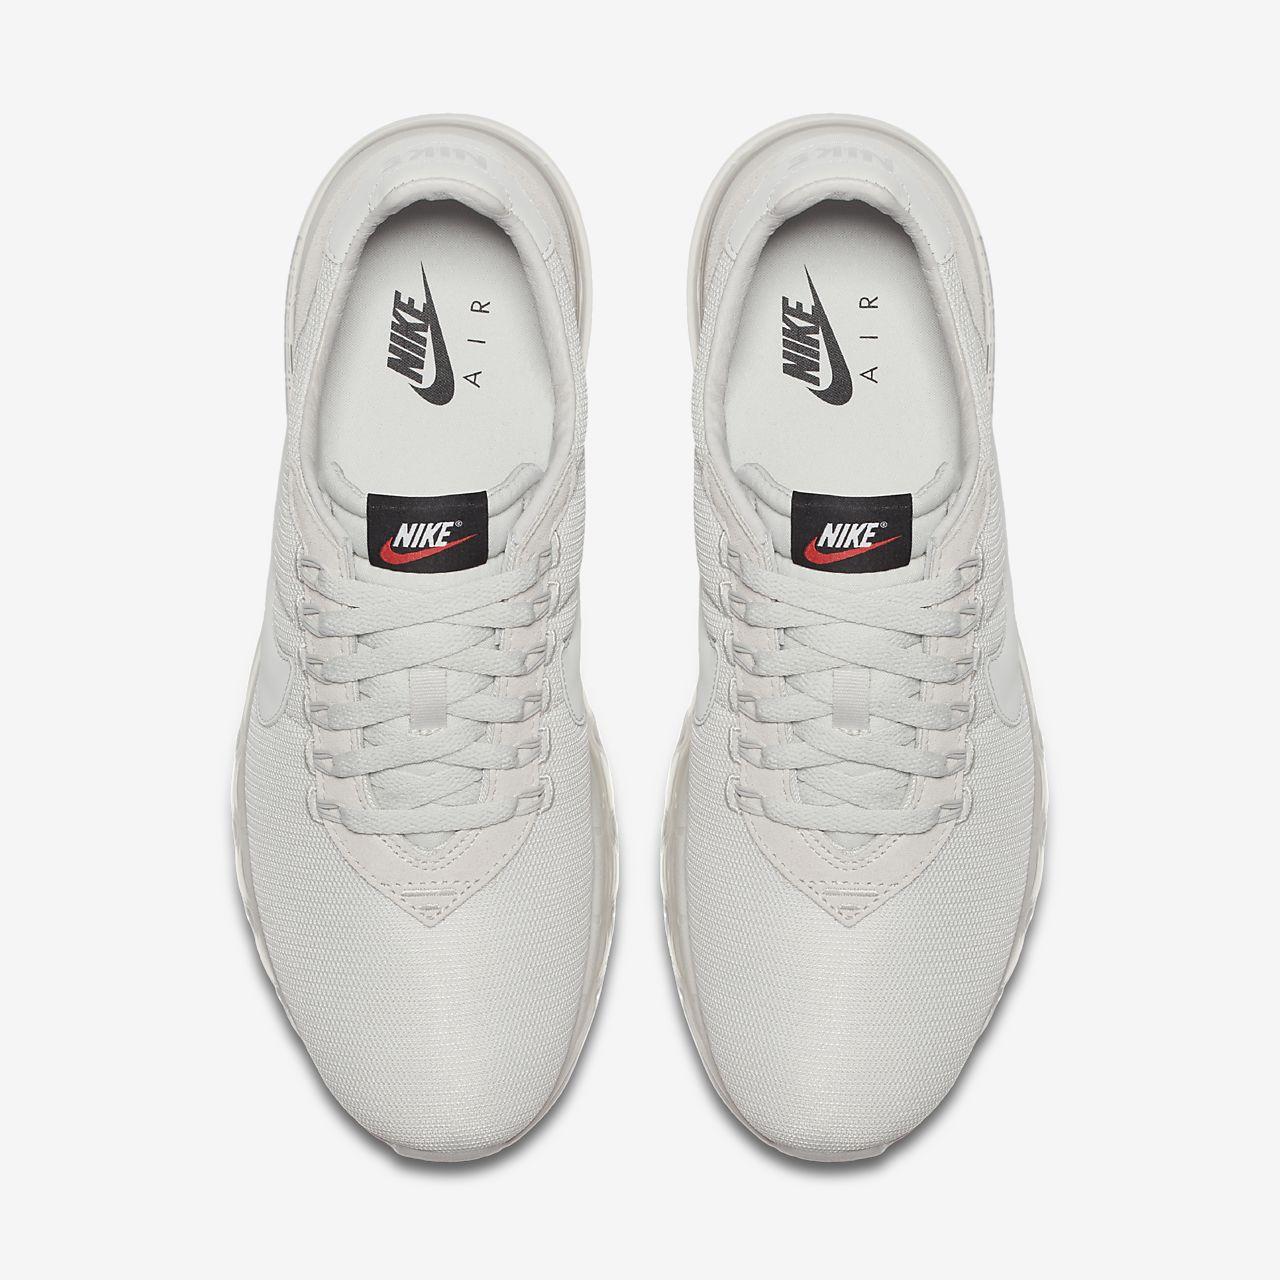 buy popular 3ee7a 2de63 ... Nike Air Max LD-Zero Unisex Shoe